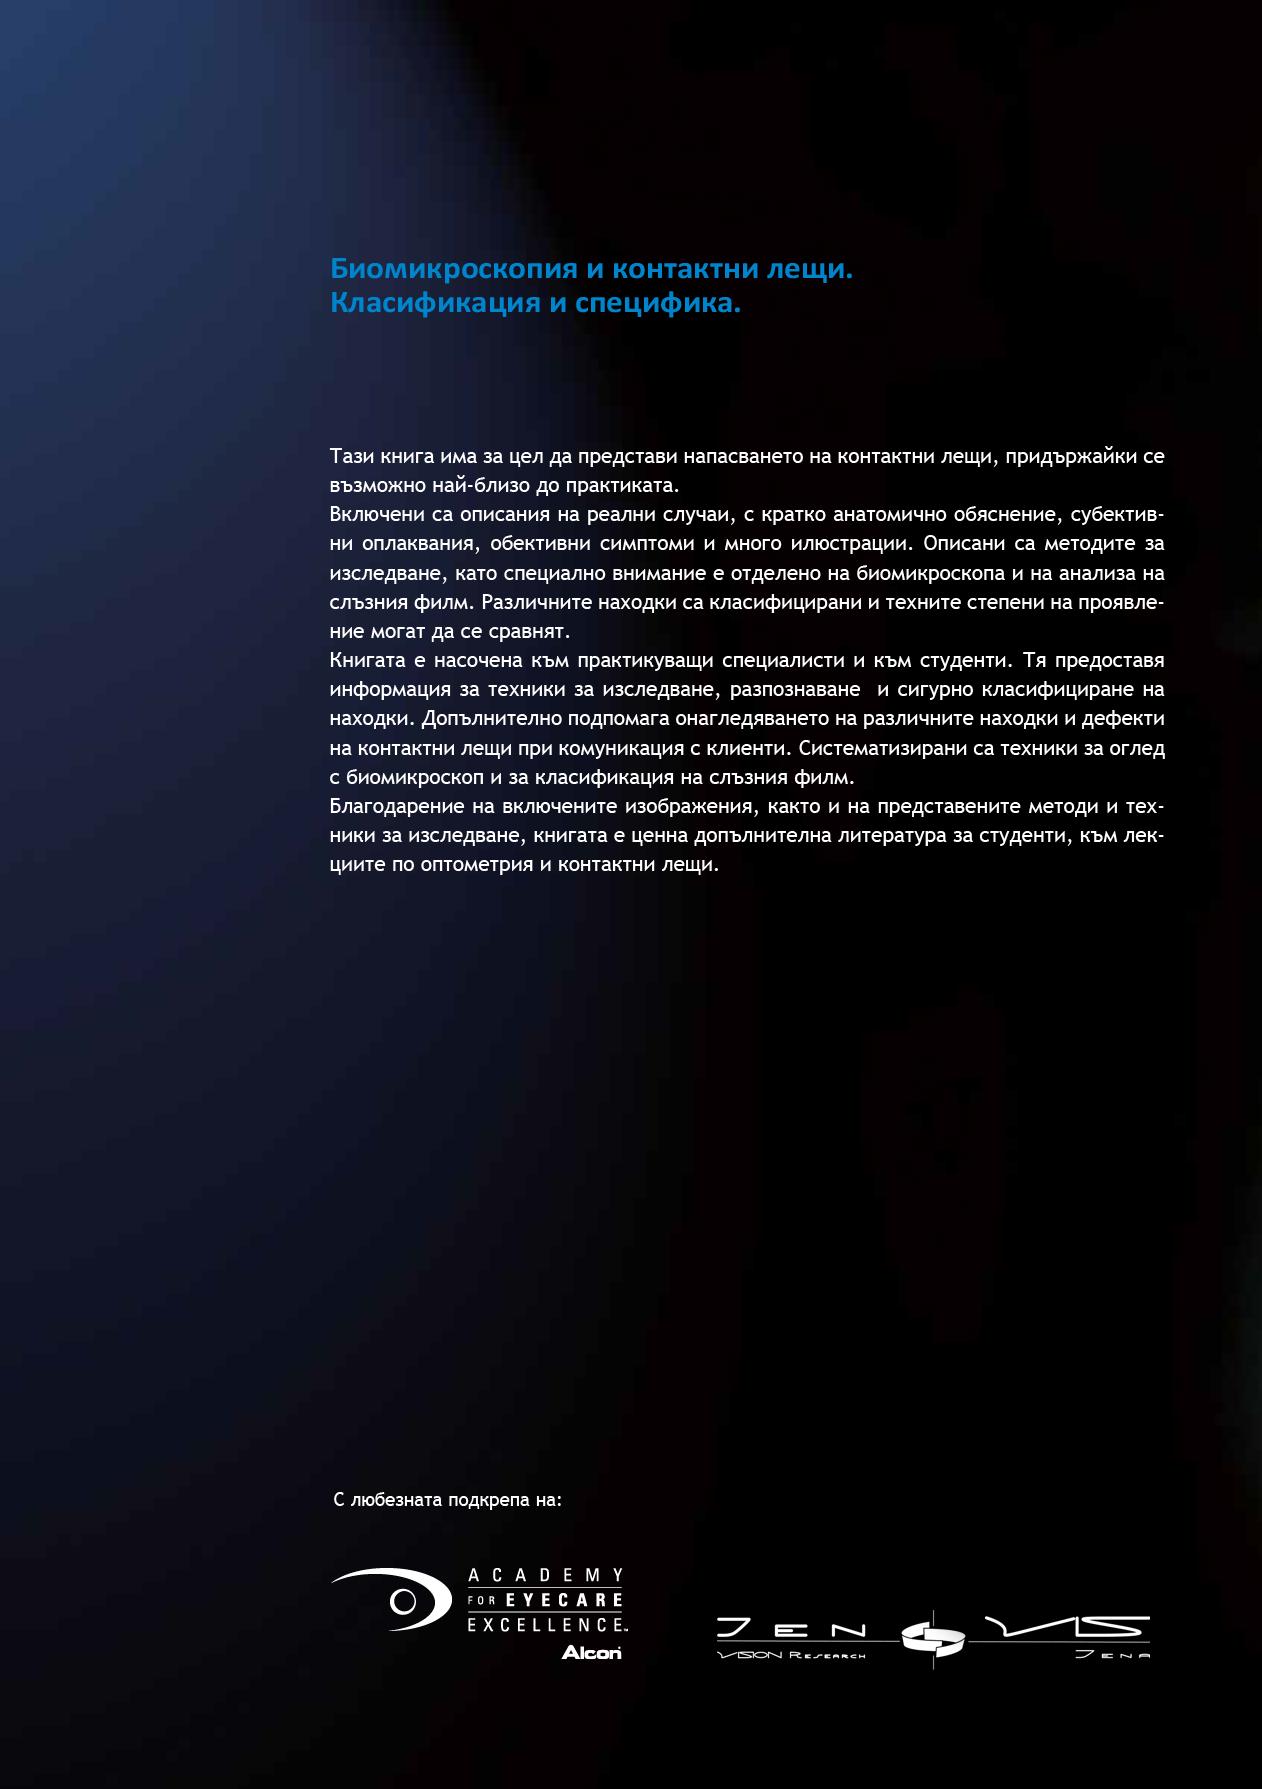 Klassifikation_von_Splatlampenbefunden_RS